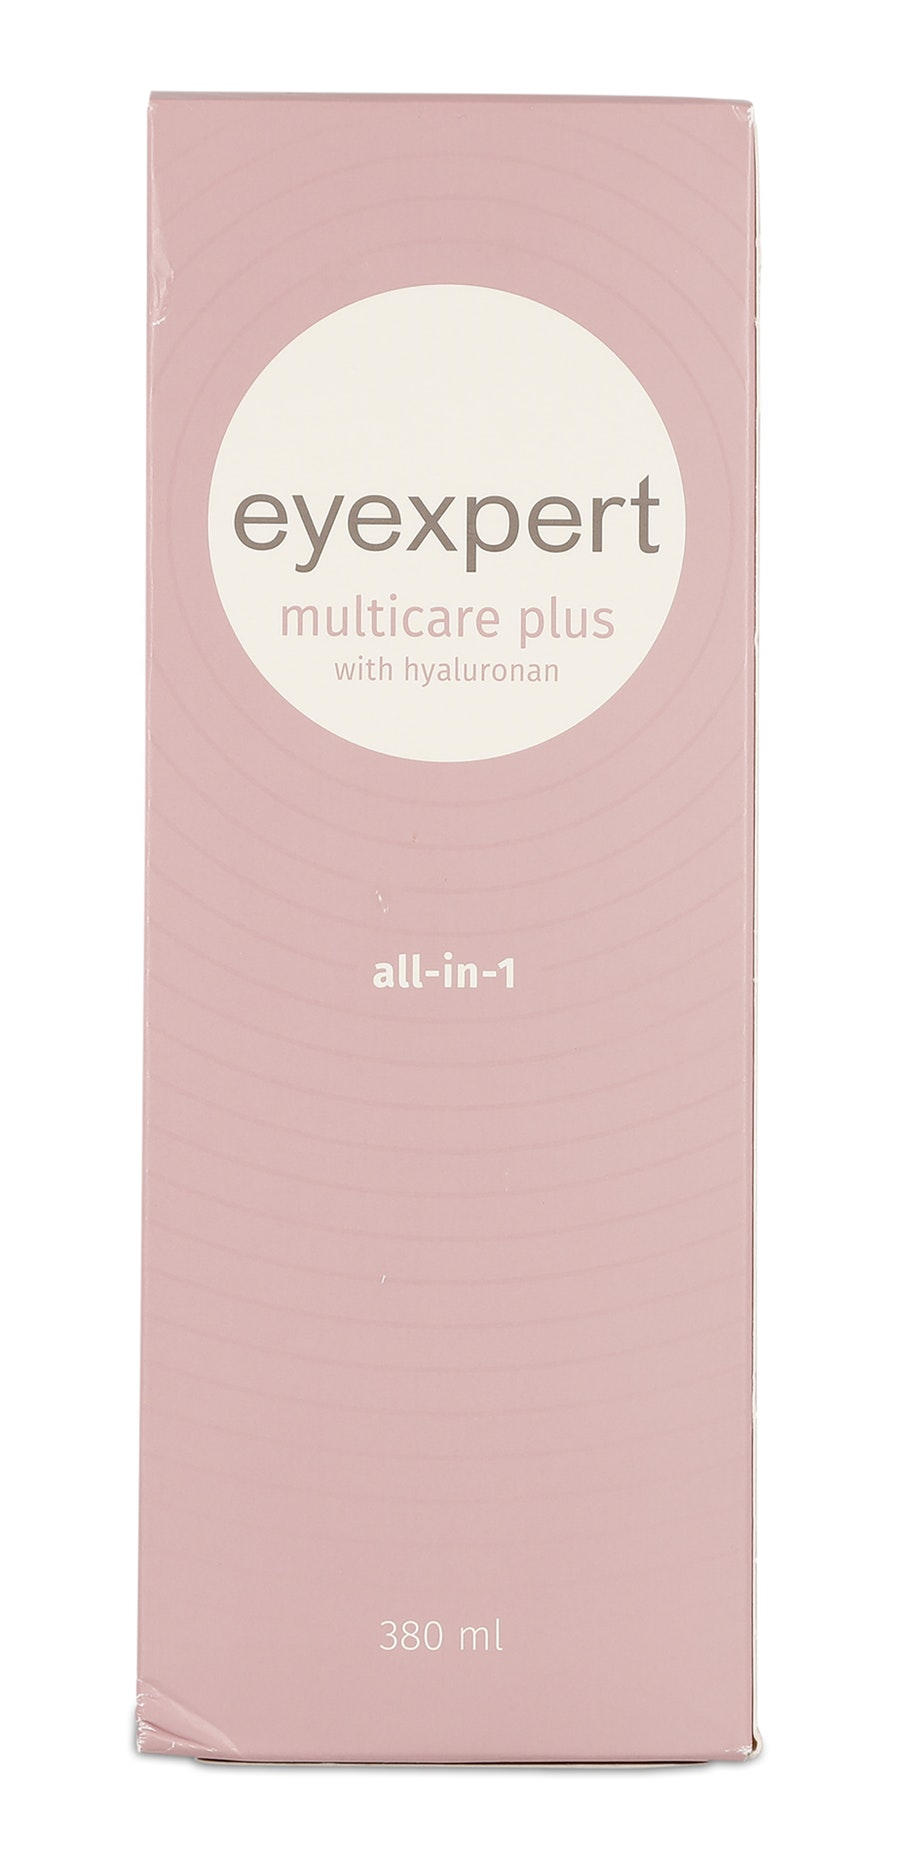 Eyexpert Multicare Plus 380ml